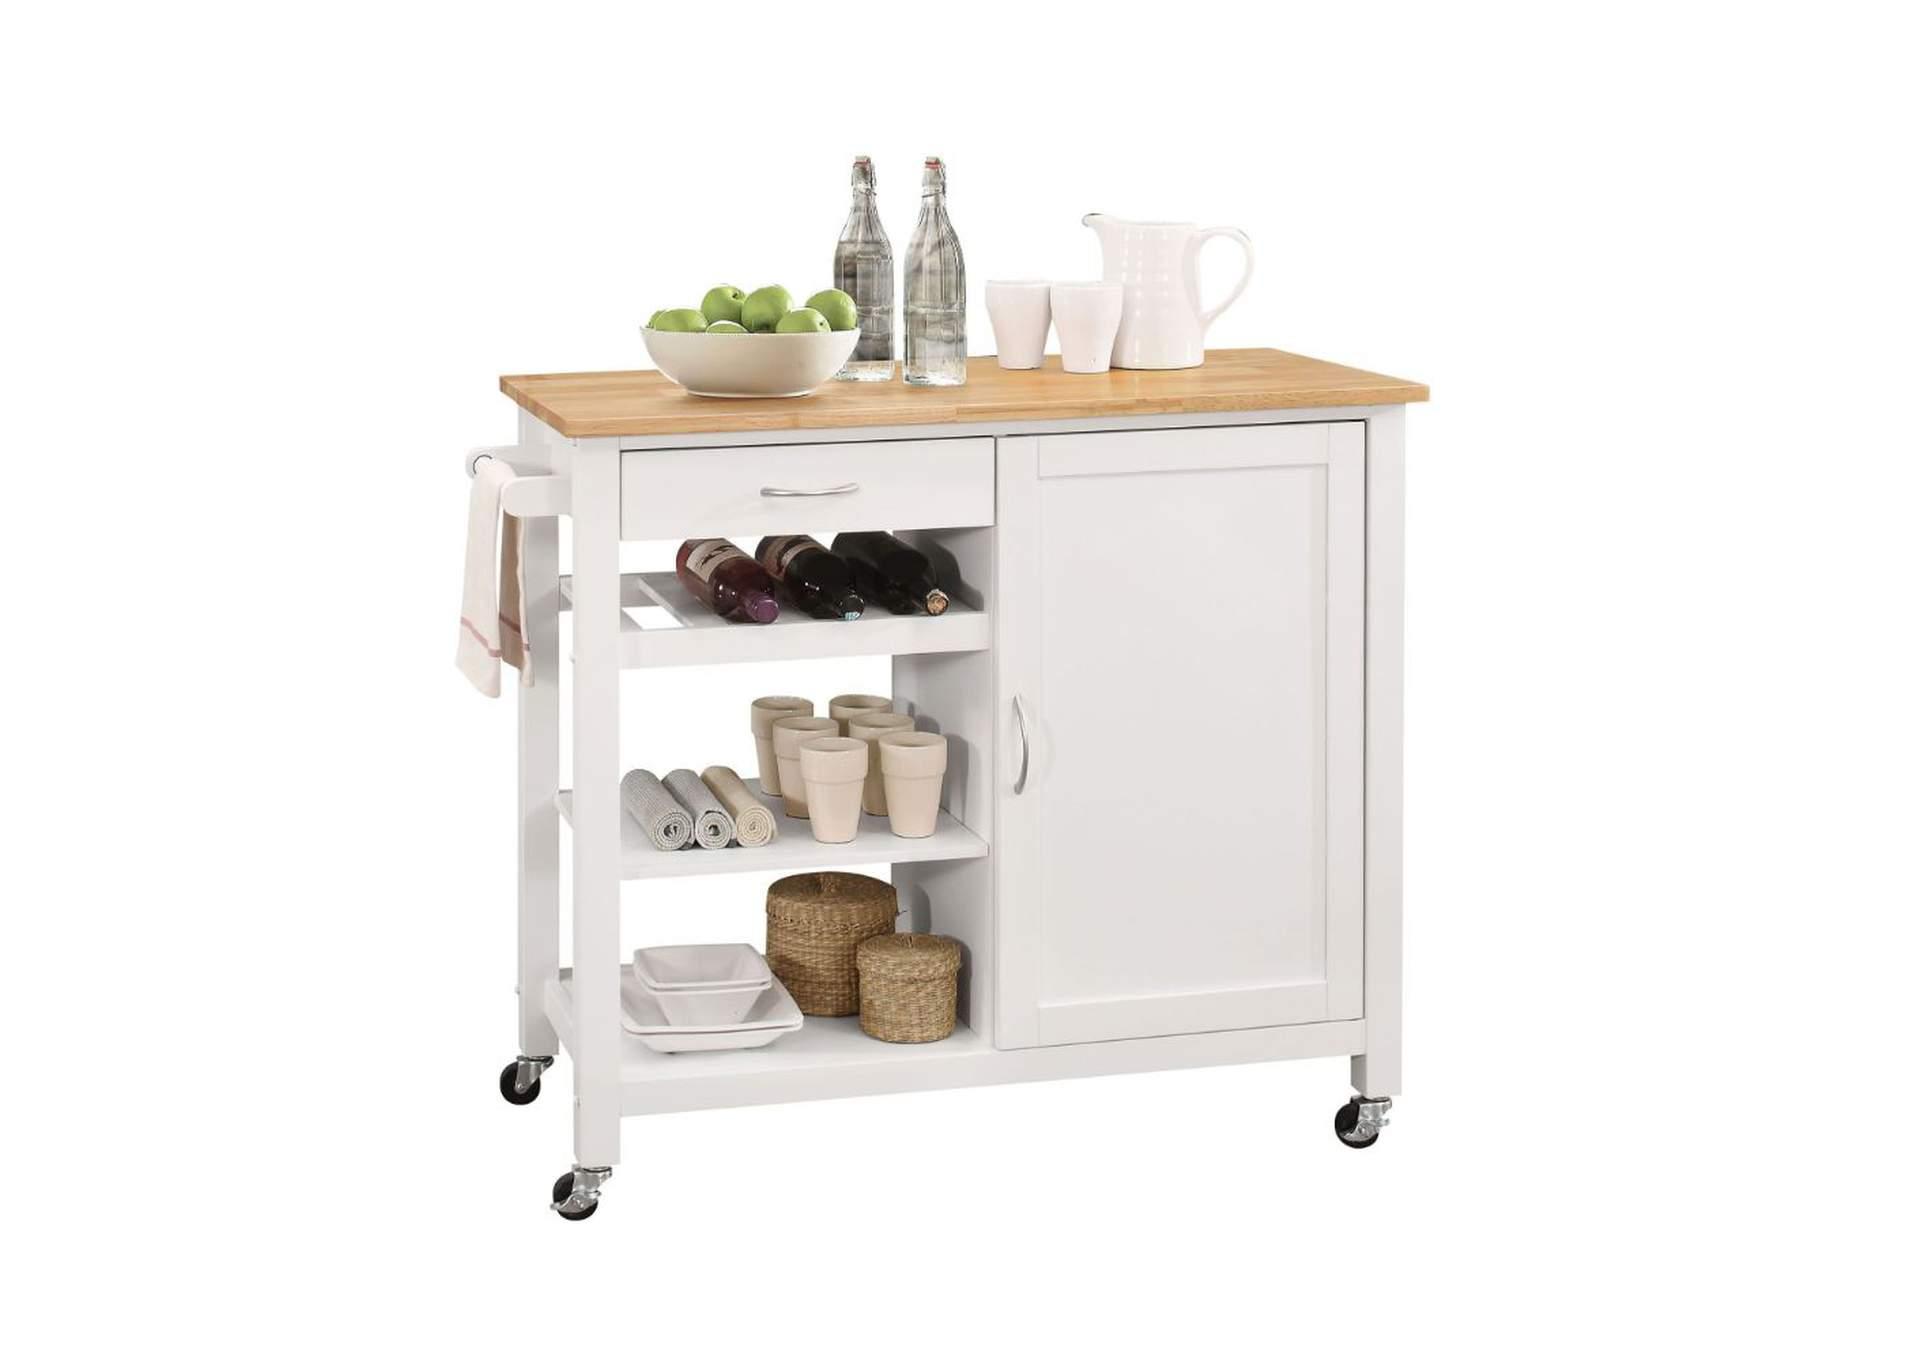 Best Buy Furniture And Mattress Ottawa White Wooden Top